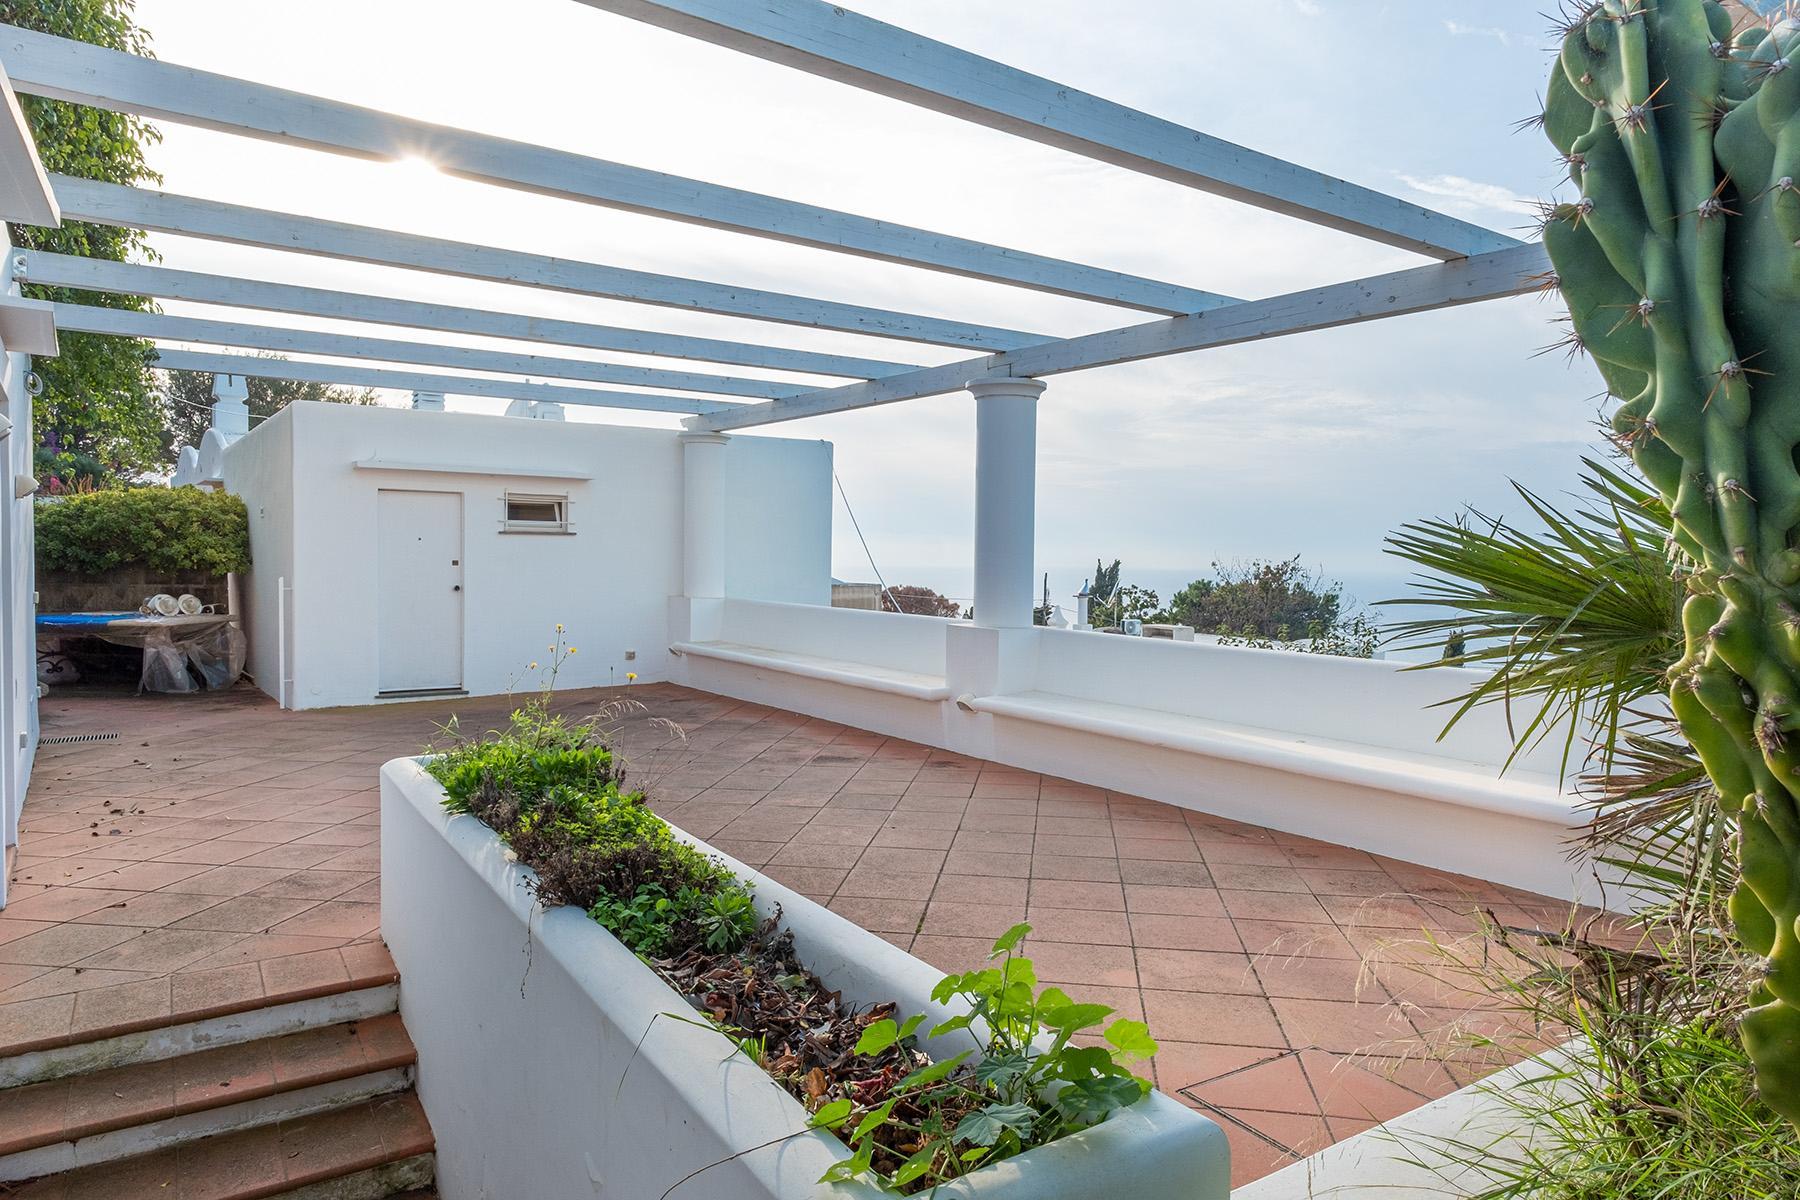 Panoramic villa with swimming pool in Anacapri city center - 18